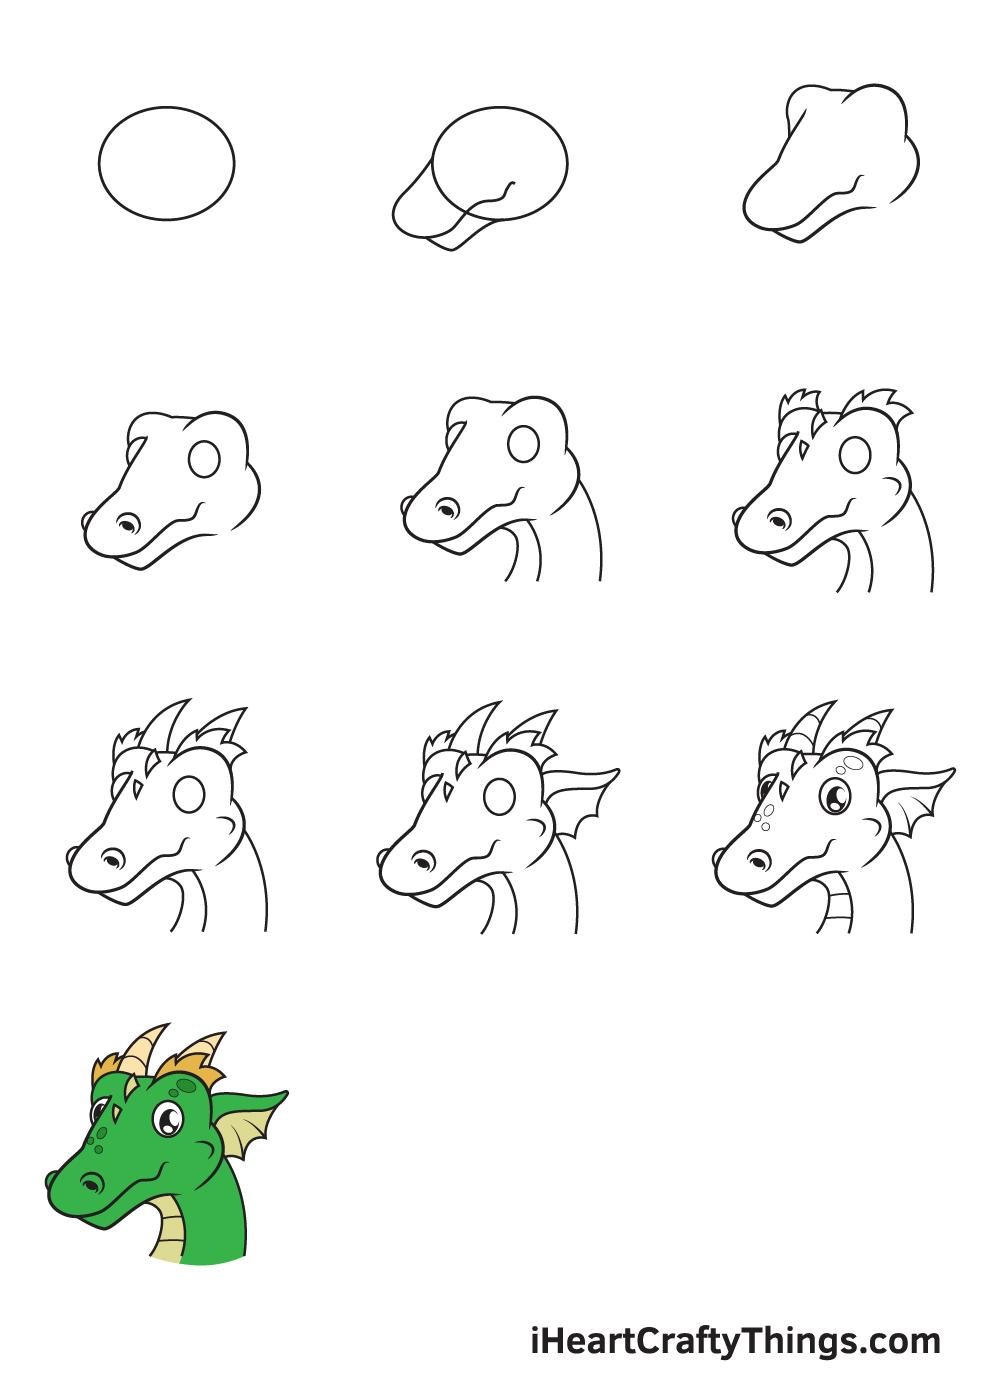 drawing dragon head in 9 easy steps